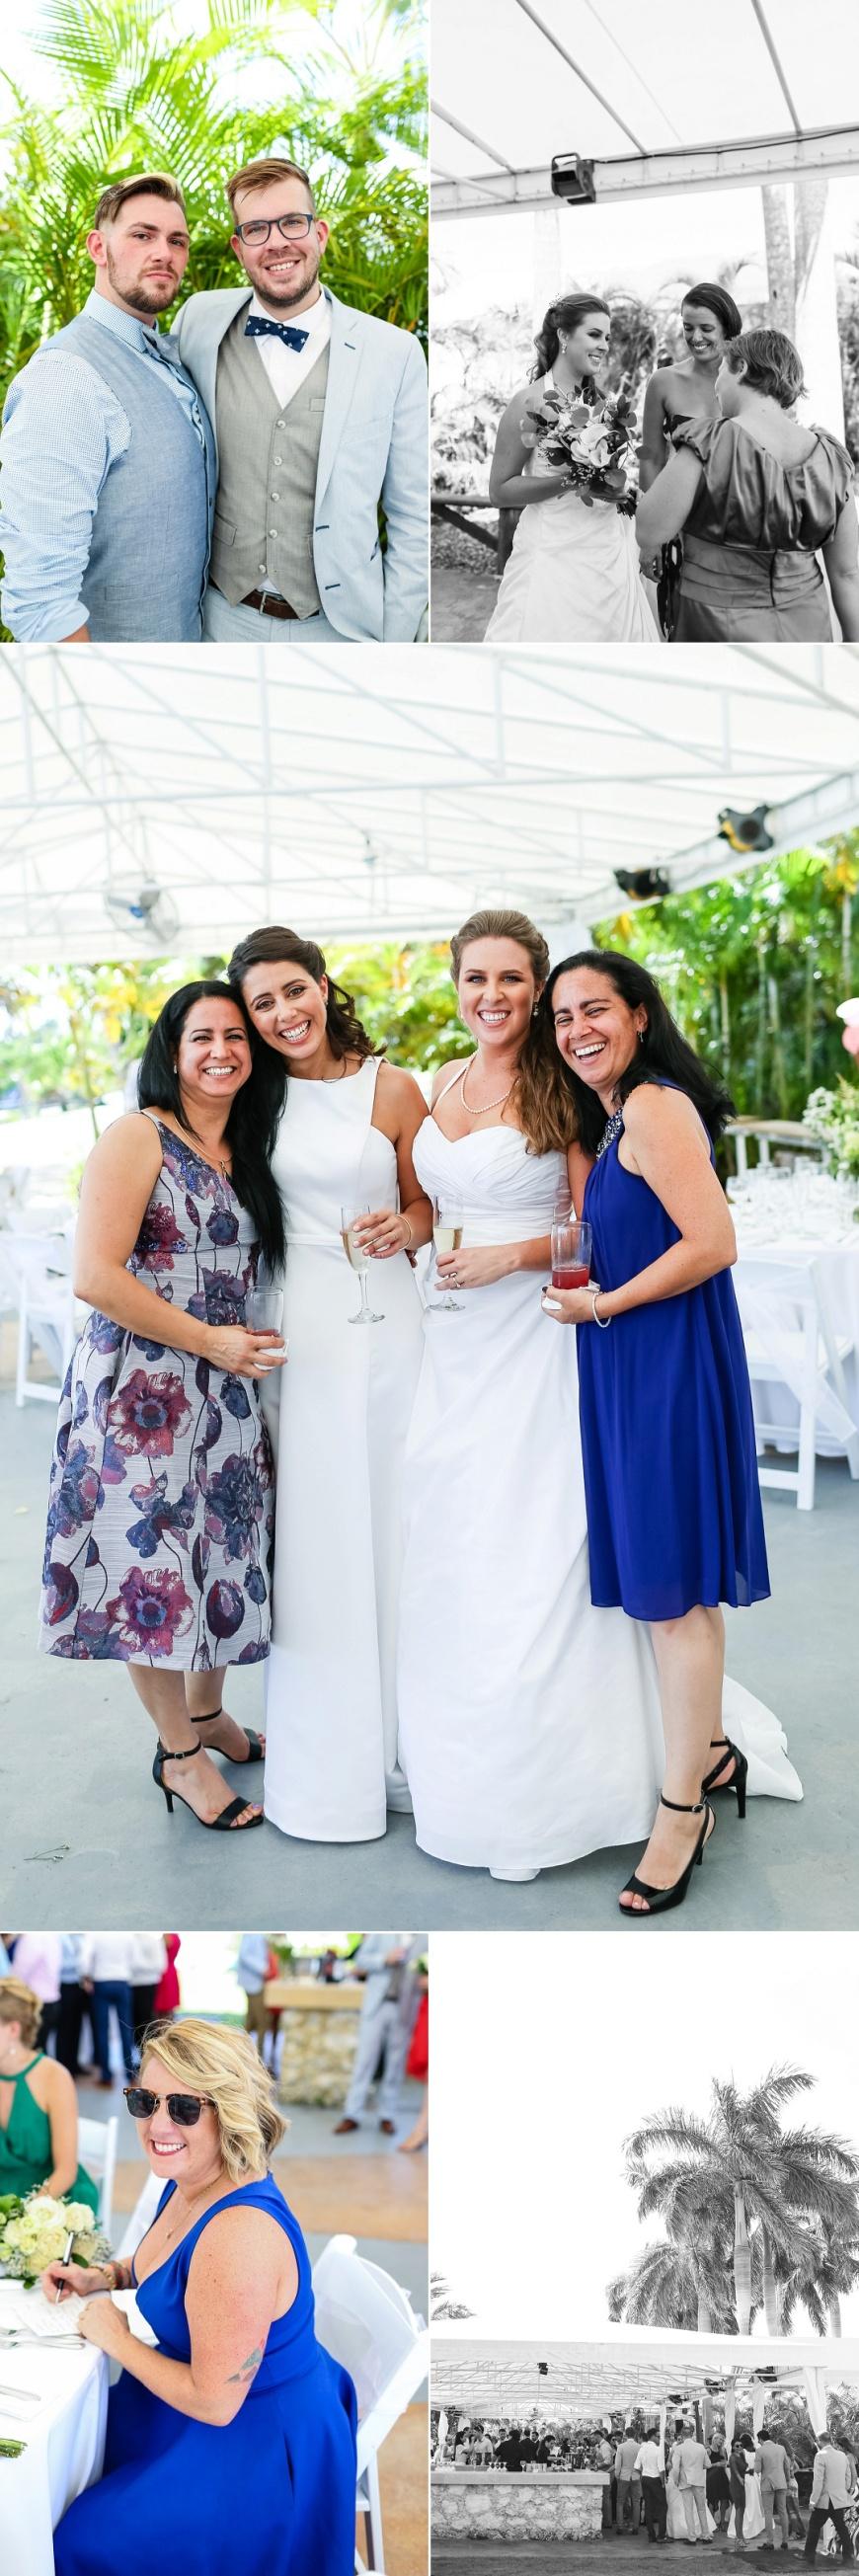 Royal-Palm-Island-Miami-Wedding-Photographer_1059.jpg